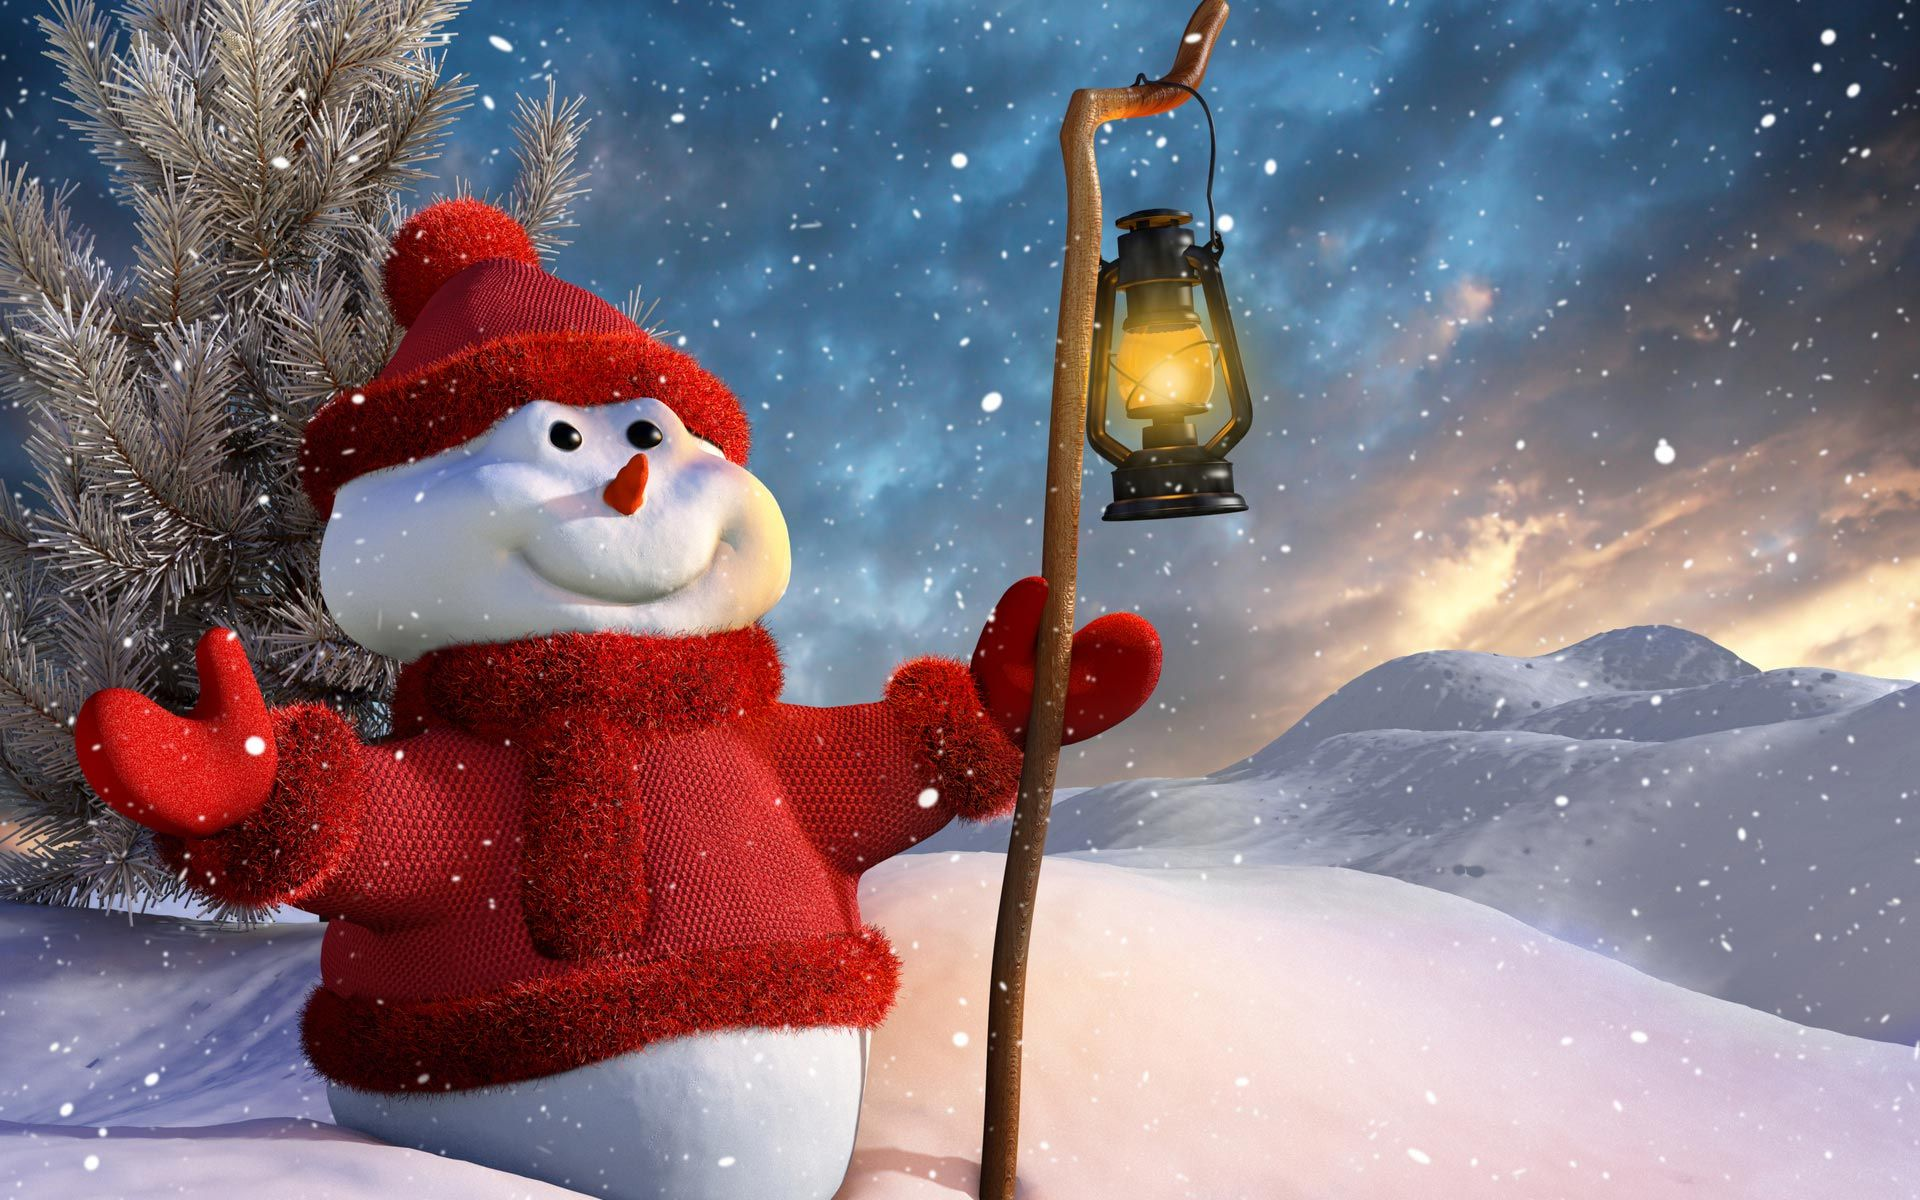 3d Snowman Hd Wallpaper Placecom Christmas Desktop Wallpaper Christmas Desktop Christmas Wallpaper